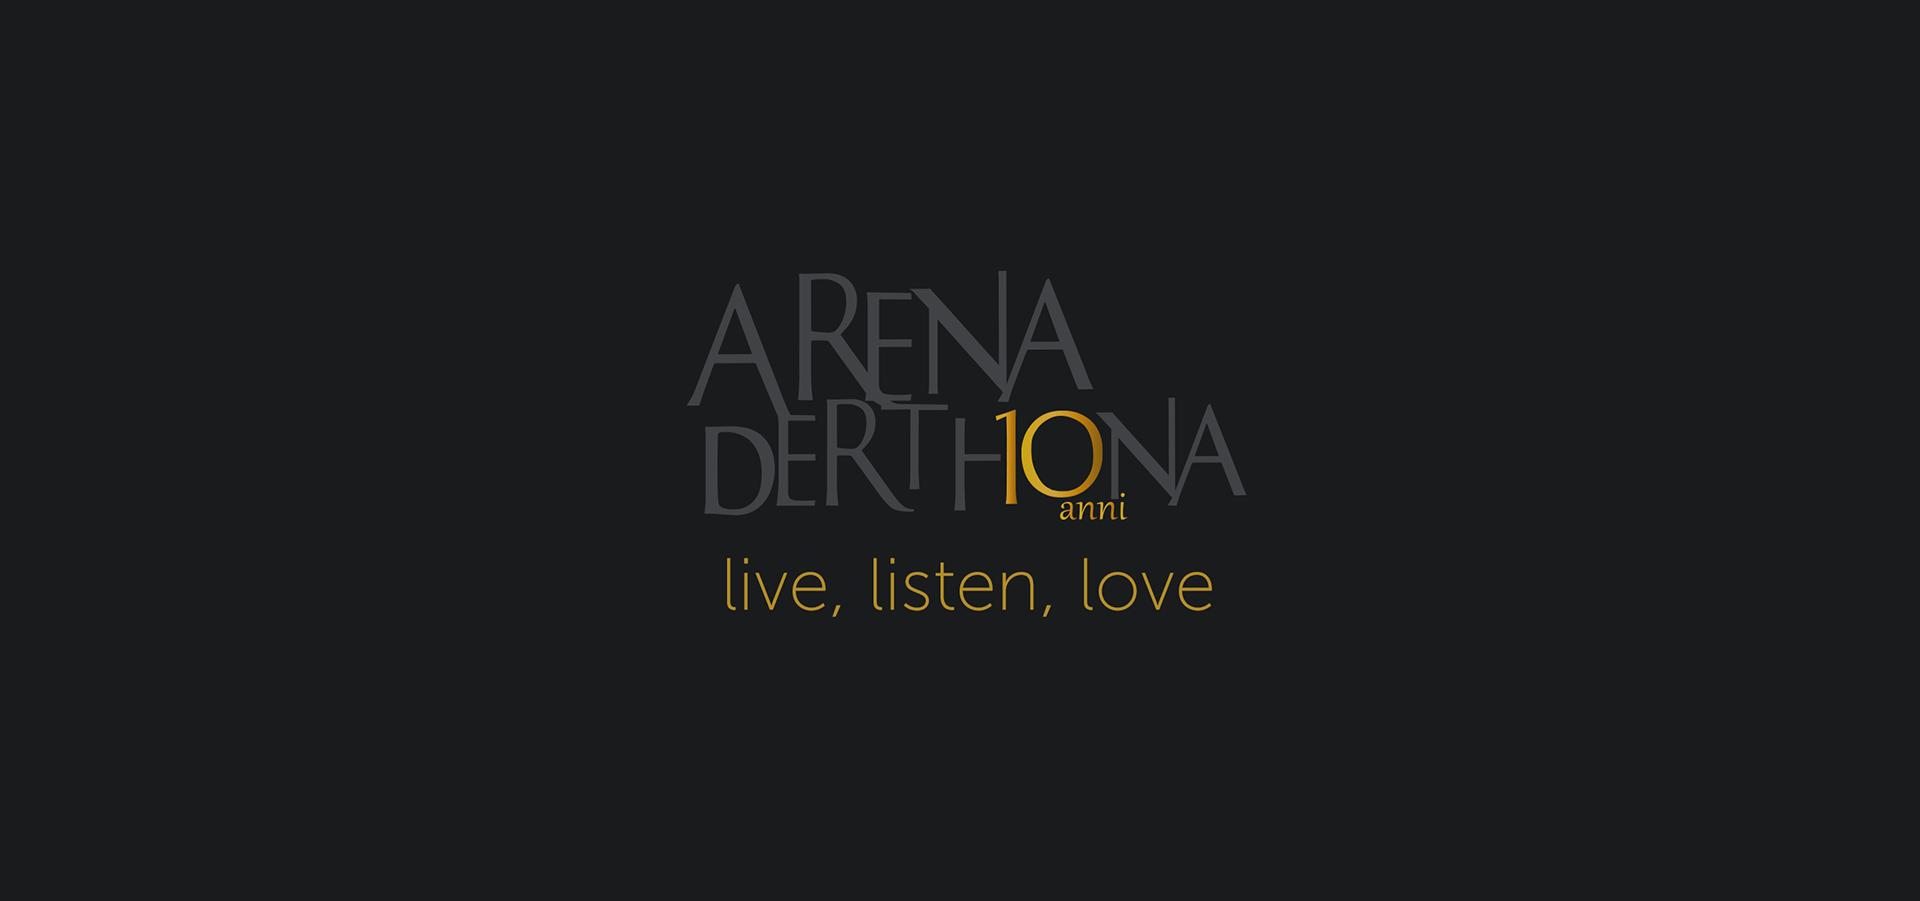 Arena Derthona - 10mo anniversario - Live, lsiten, love - Teatro Civico Tortona